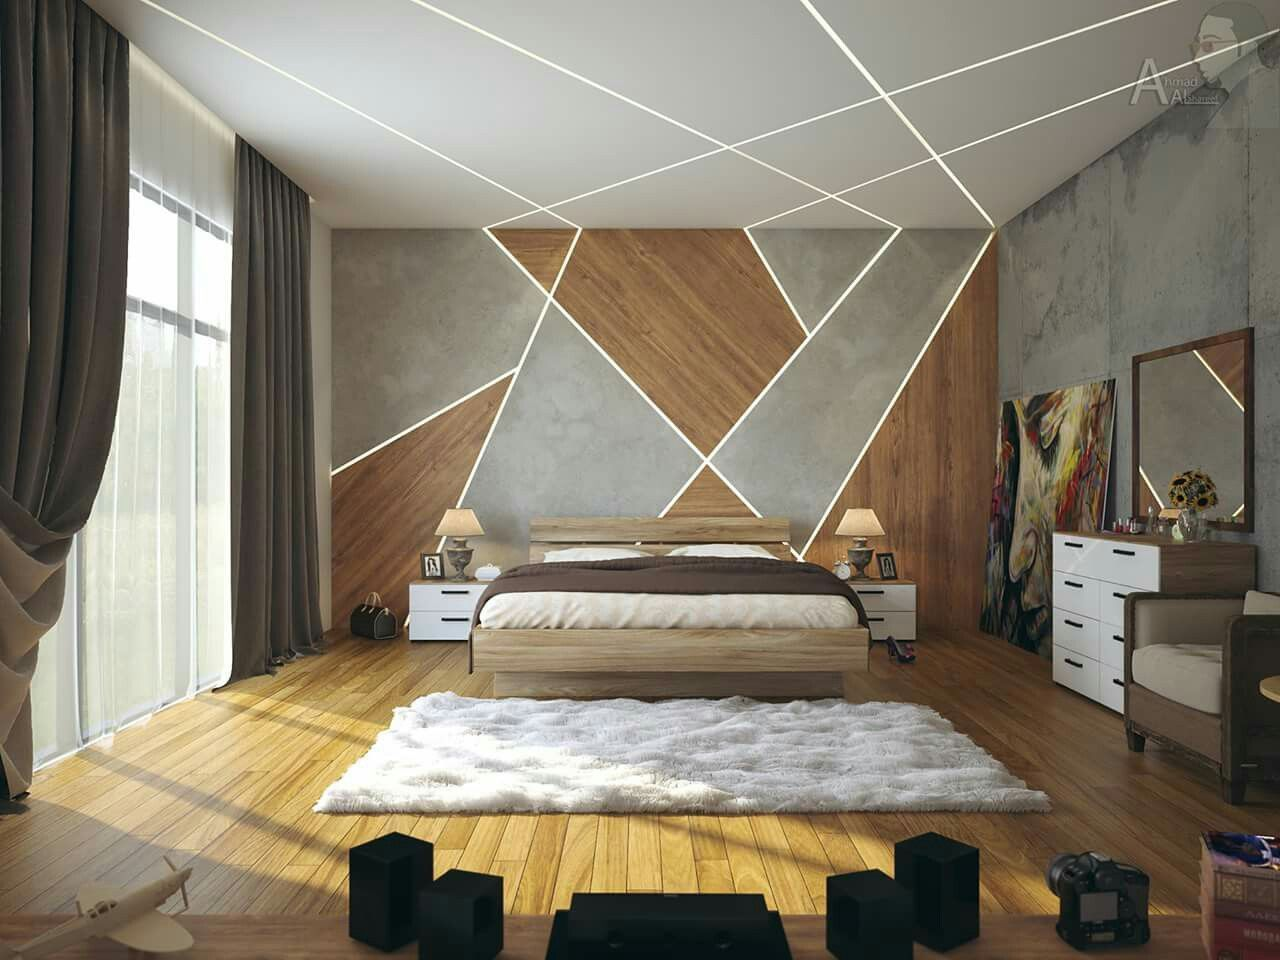 Soo cool | Bedroom false ceiling design, Bedroom design ...